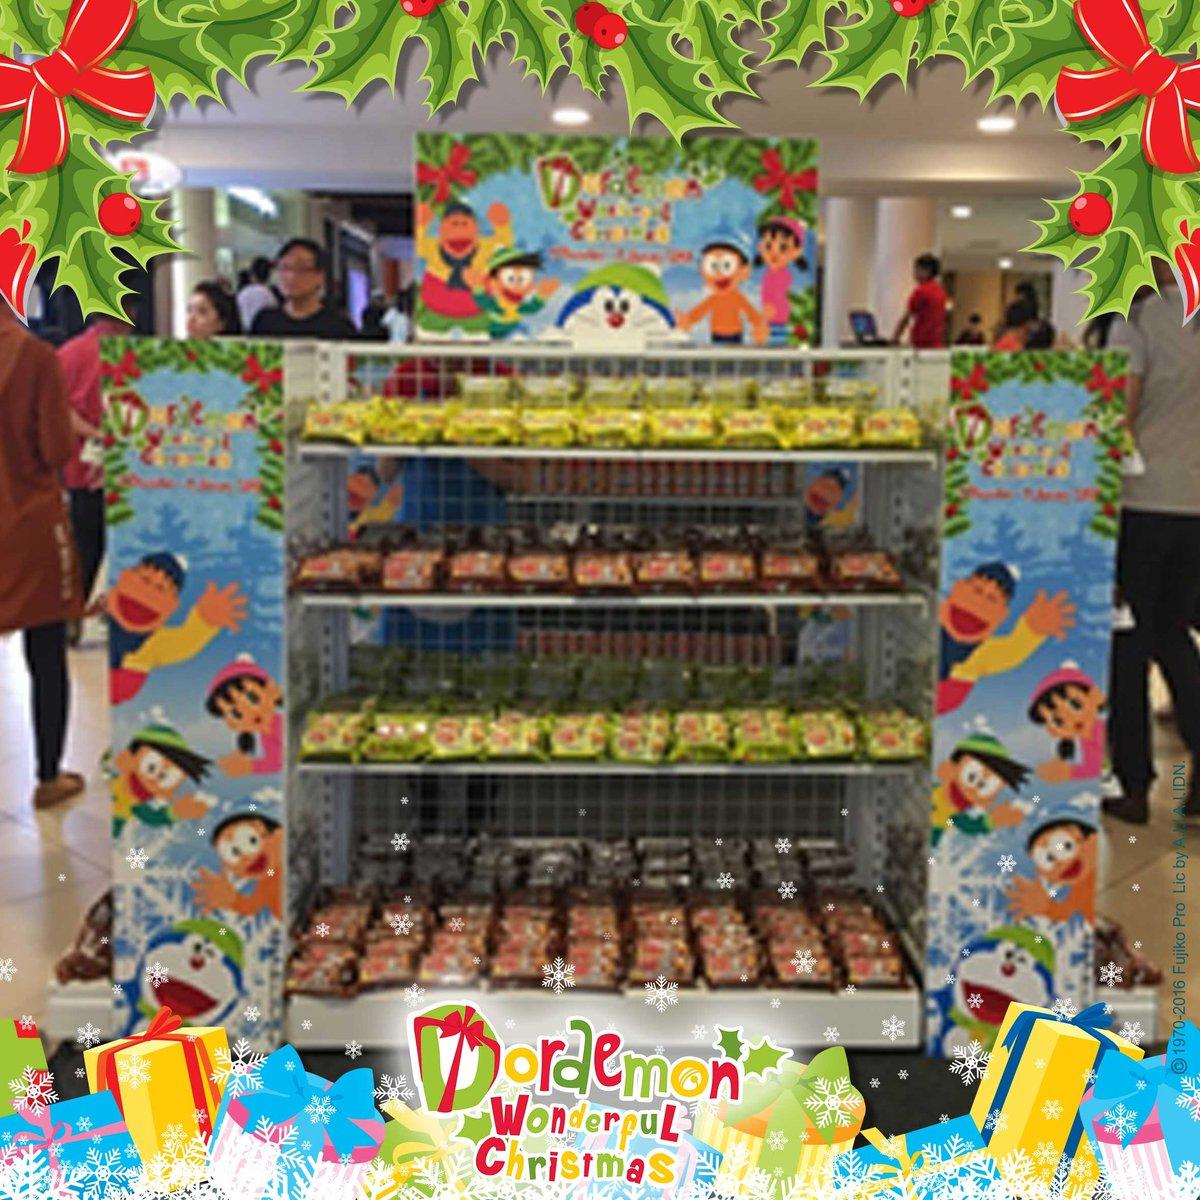 Ingin camilan?  Camilan Doraemon adalah yang terbaik saat kalian sedang kelaparan.  #DoraemonMania #ILoveDoraemon #DoraemonIndonesia https://t.co/MSnSq8TRM6